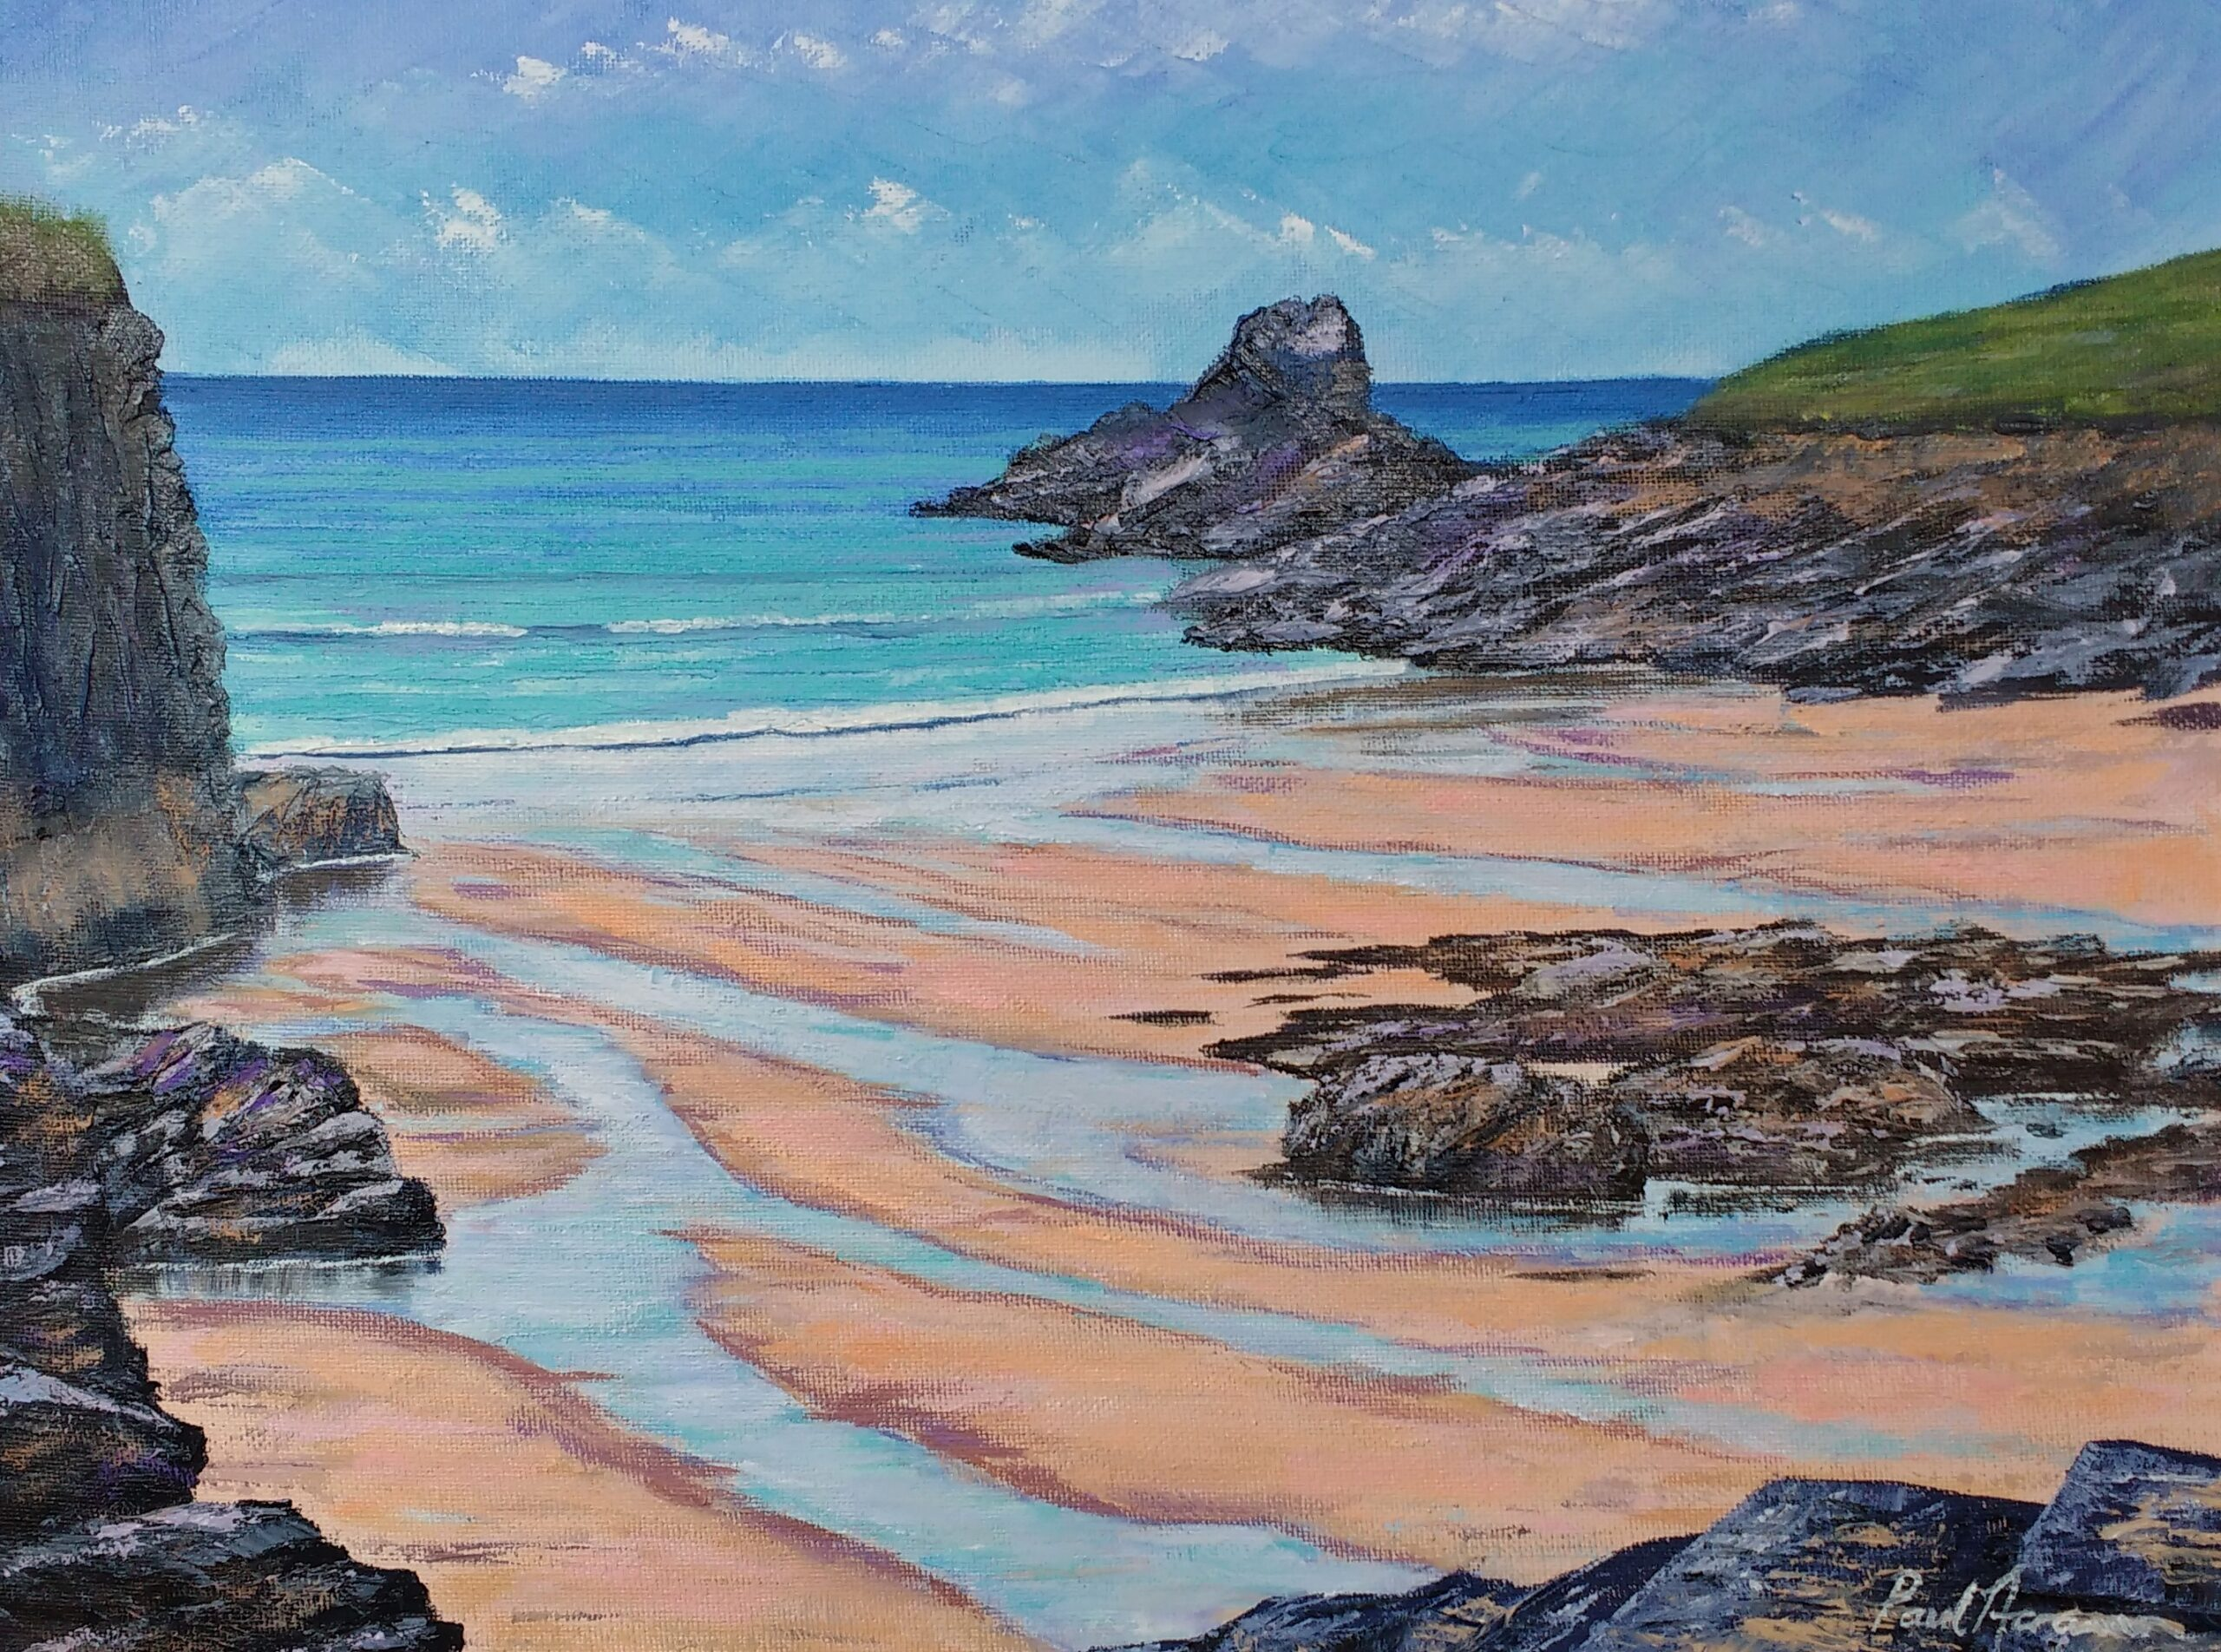 Paul Acraman-seascape-painting-Algarve-Ponta da Piedade, Lagos 2